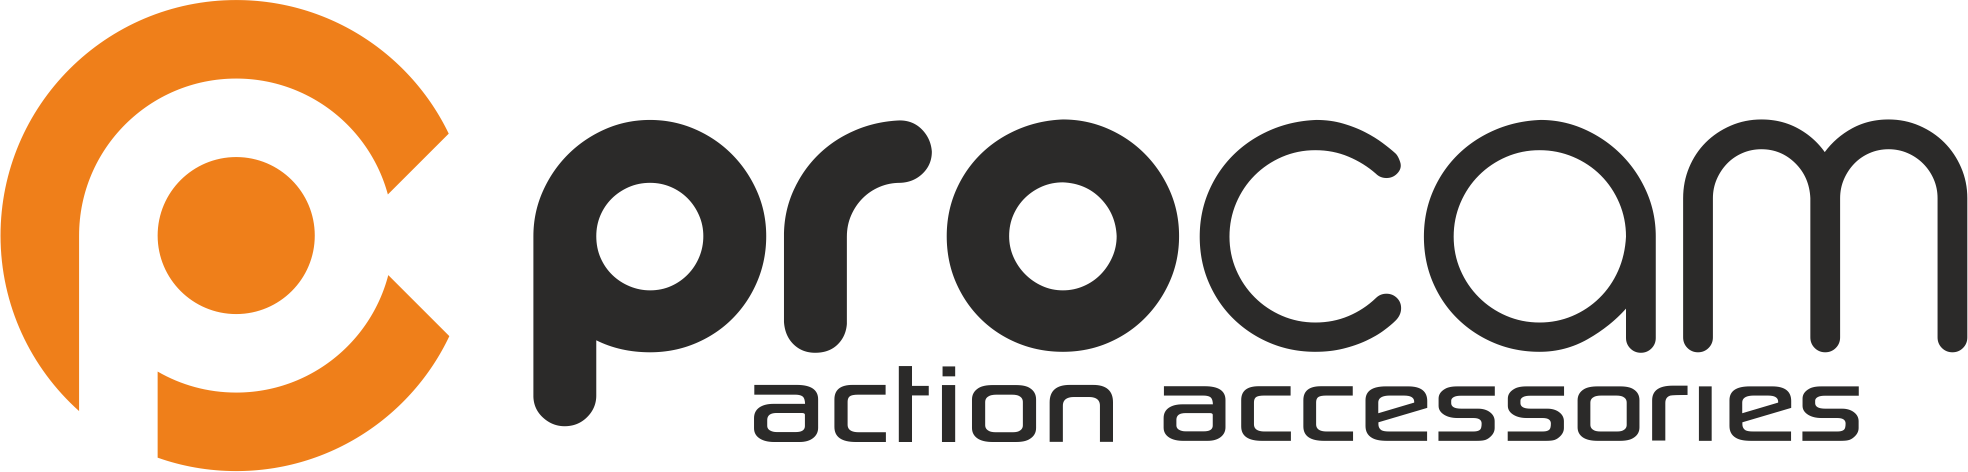 Proсam - Action Acessories